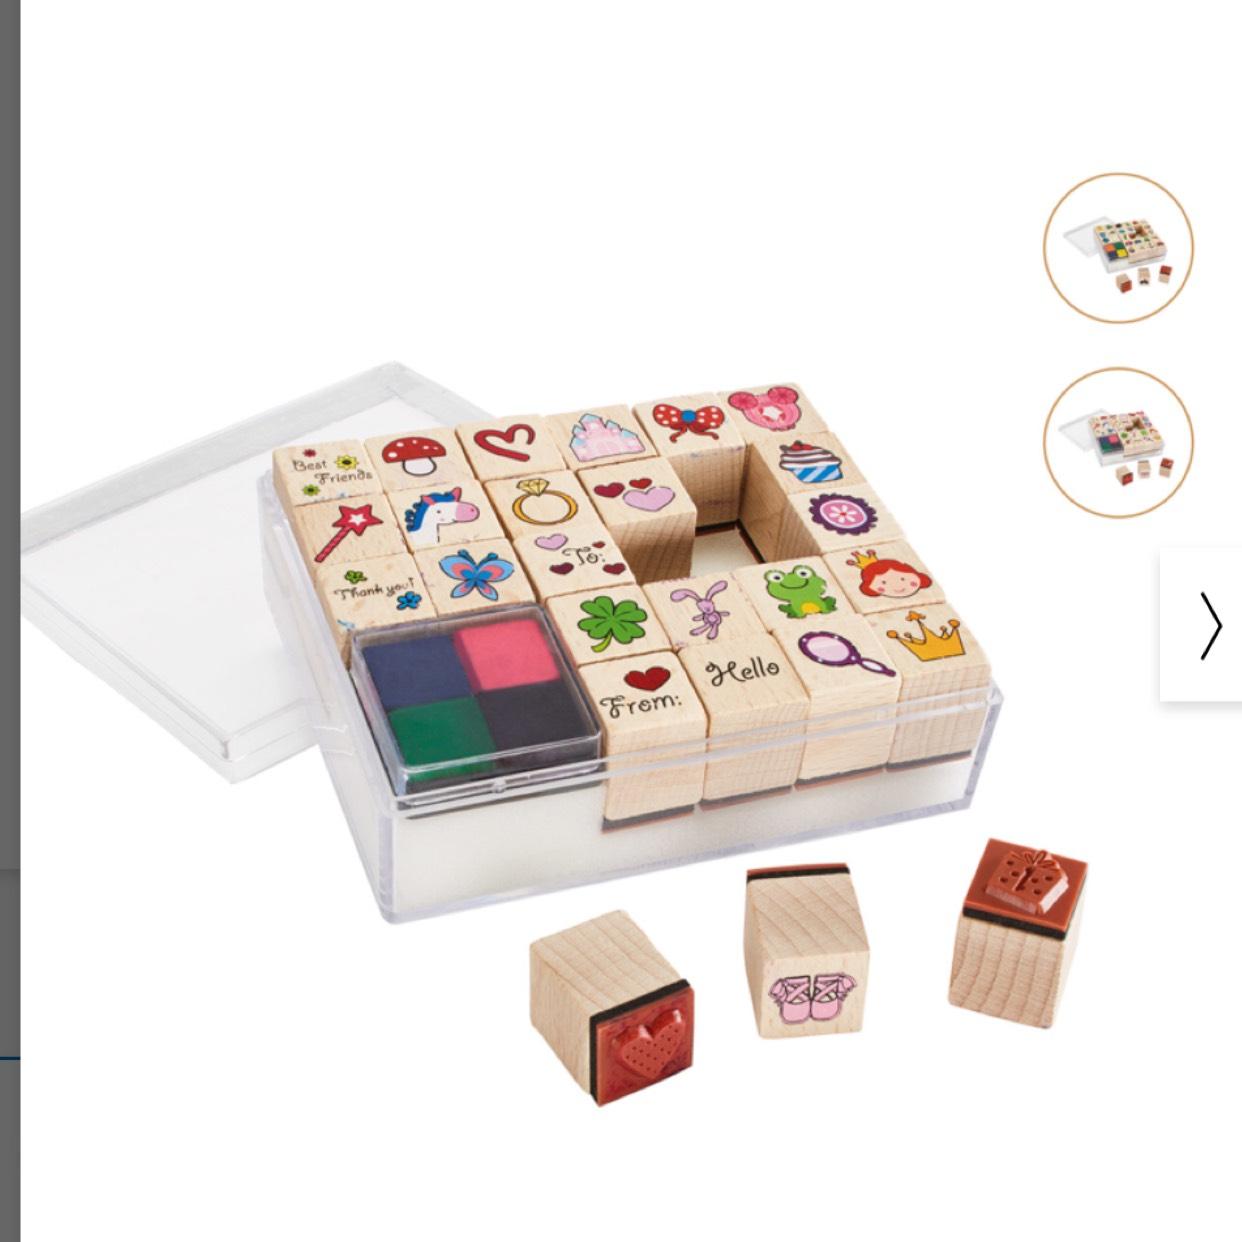 Unleash your creativity! Crelando Stamp Set (2 different design) £3.99 @ Lidl